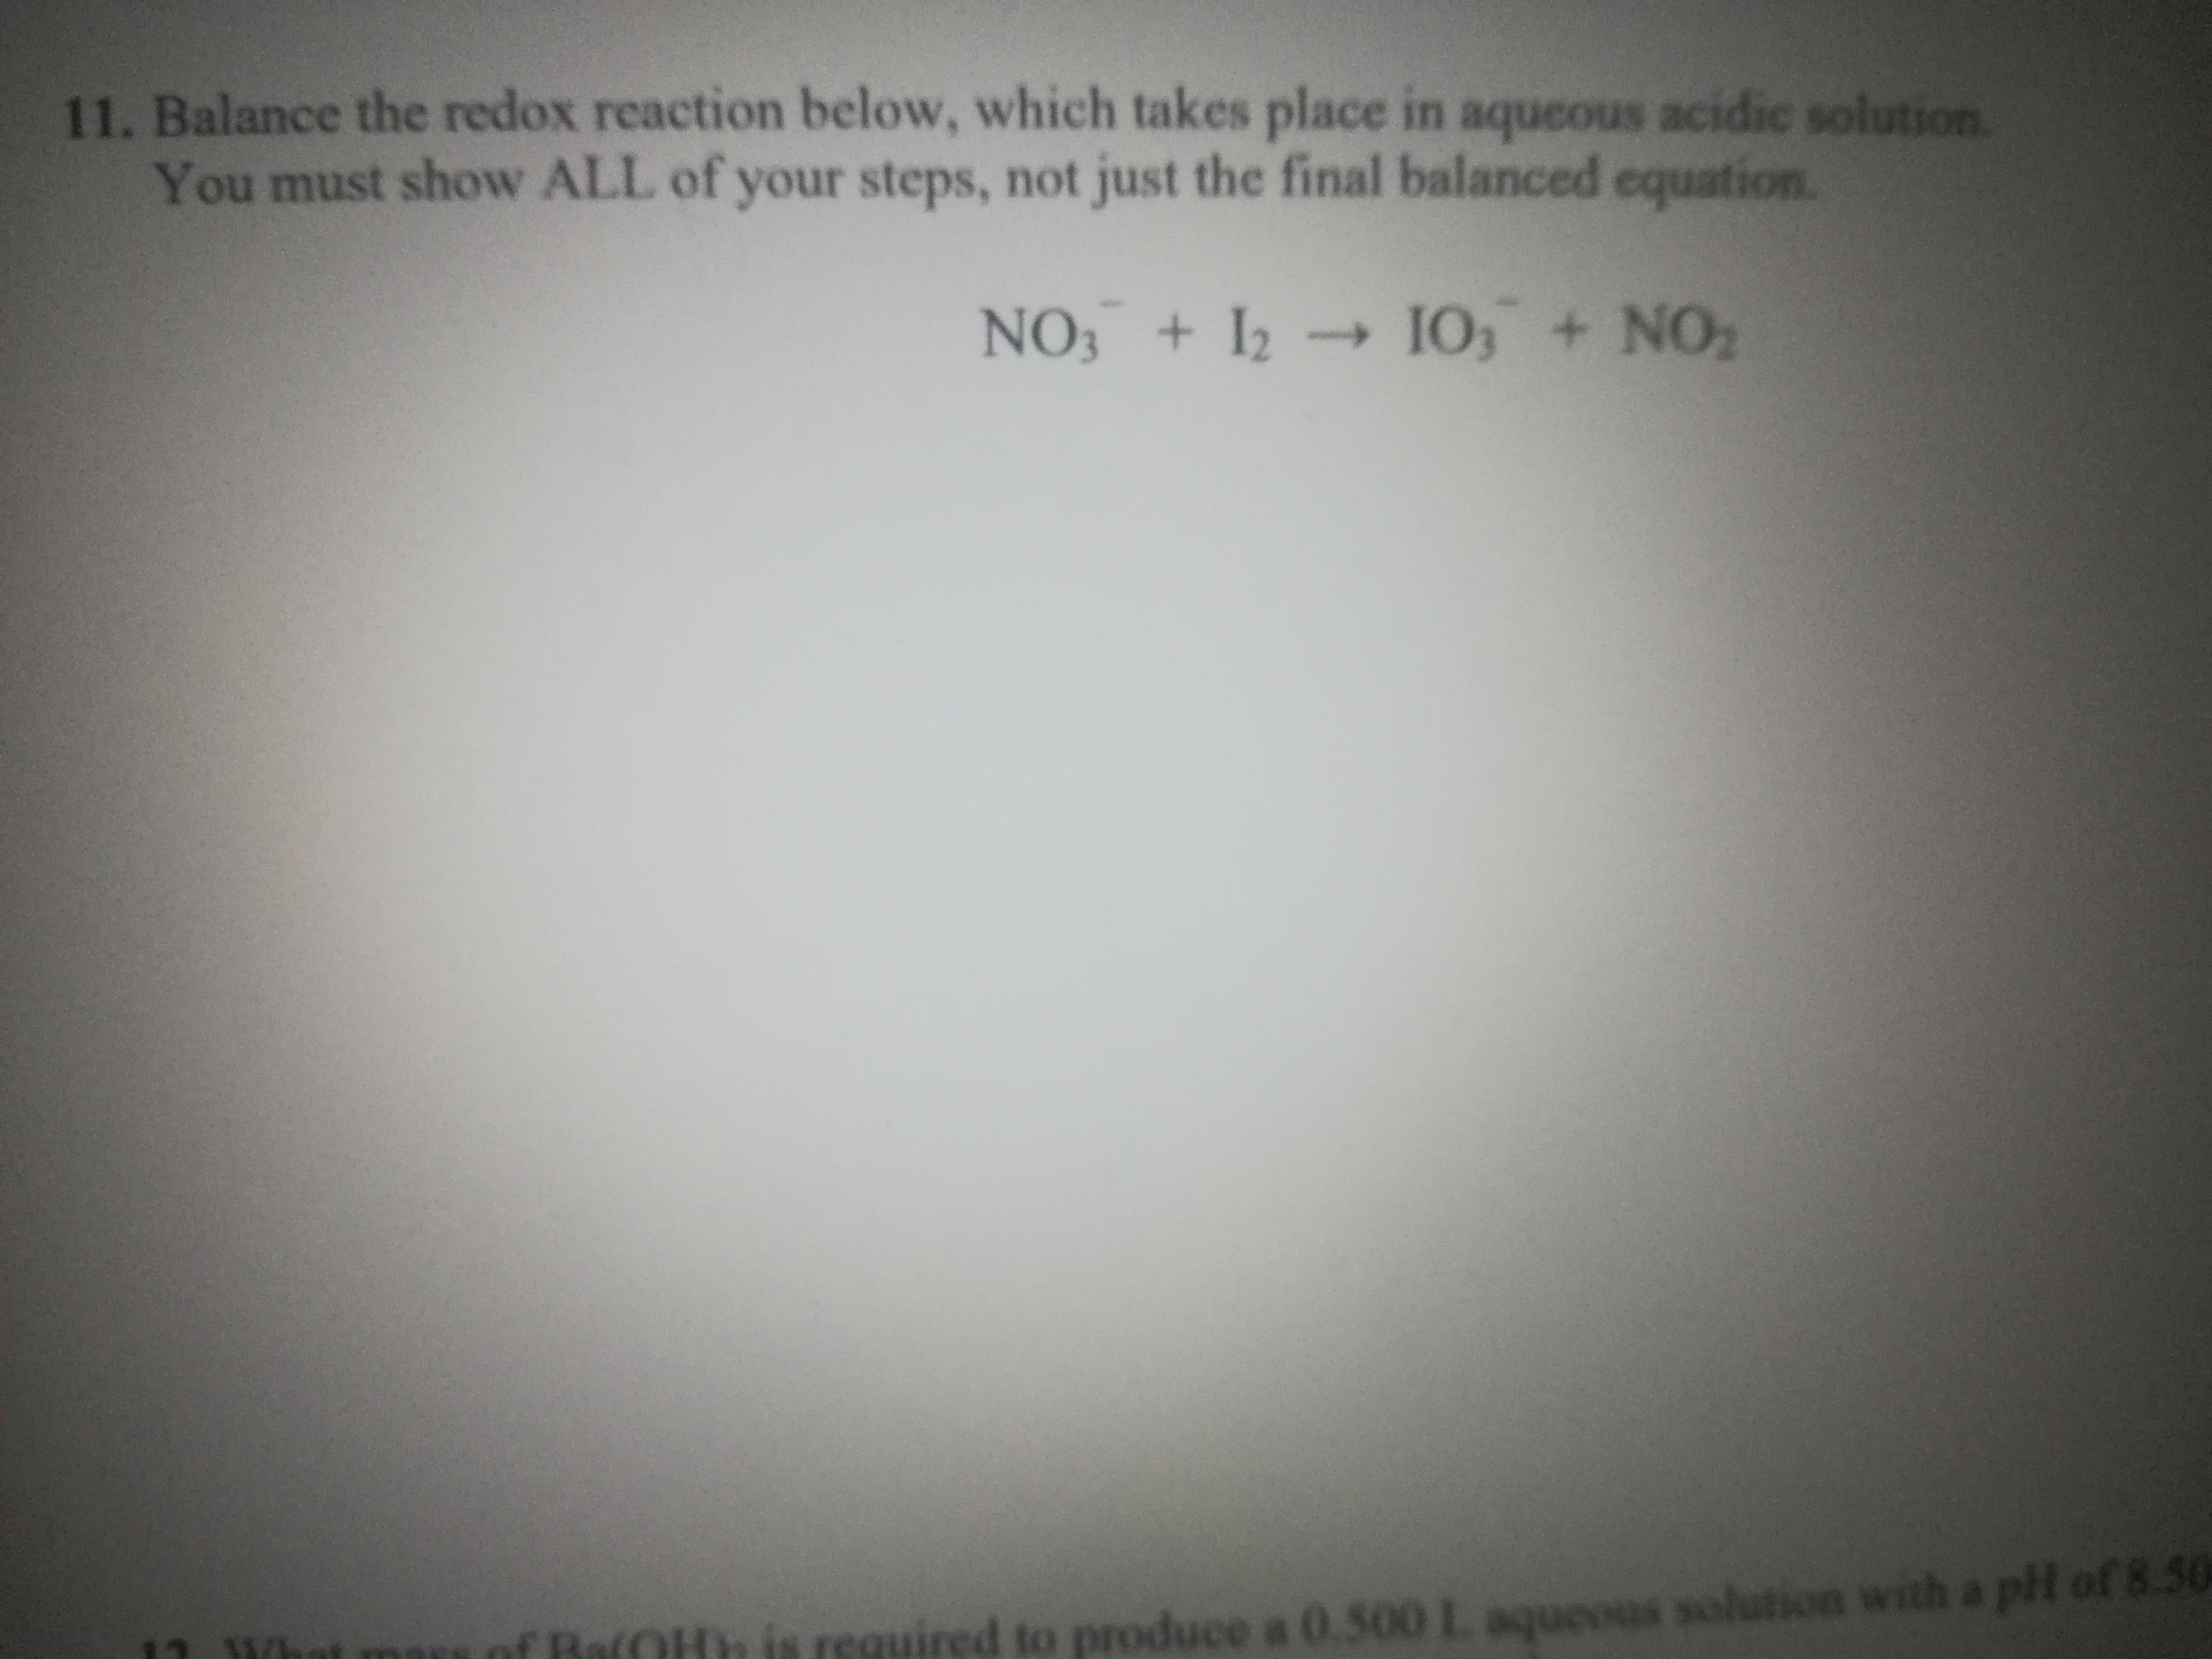 Answered 11 Balance The Redox Reaction Below